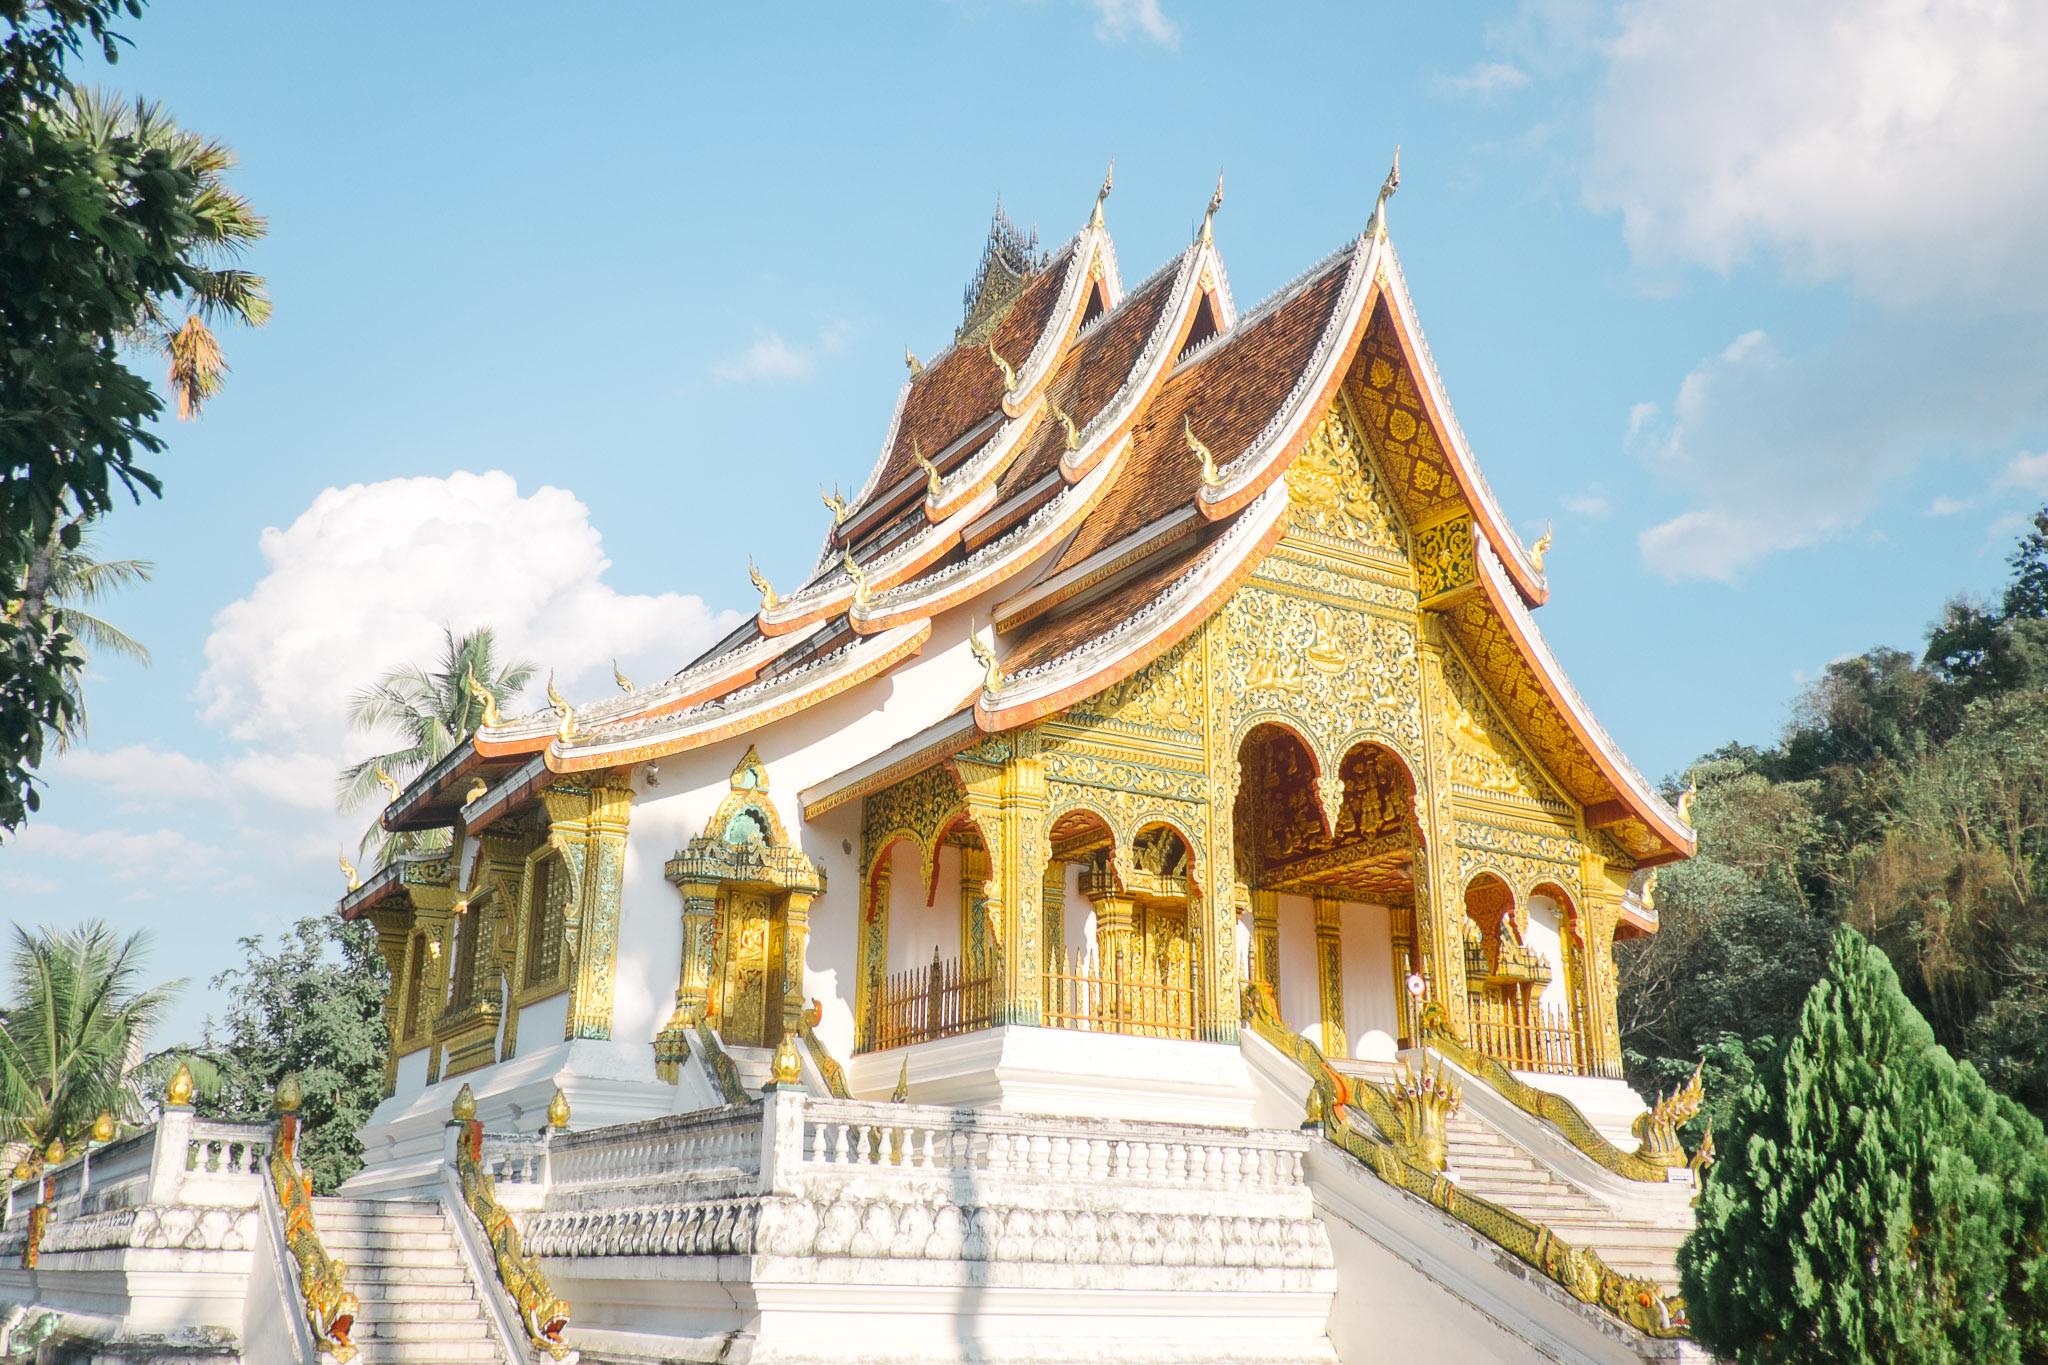 laos-luang-prabang-royal-palace.jpg